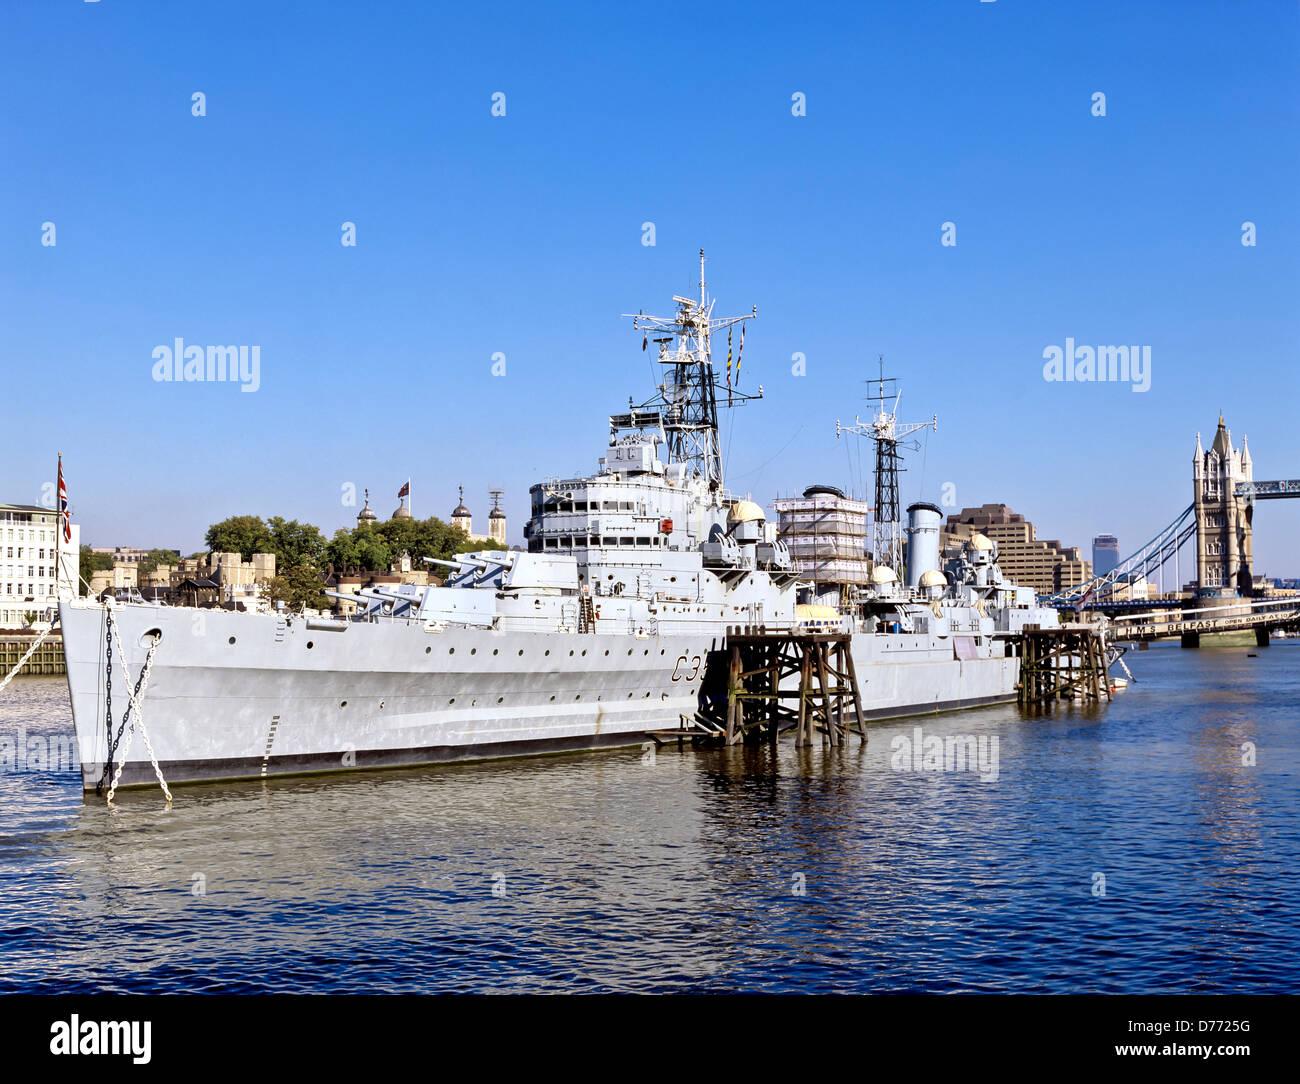 8668. HMS Belfast & R Thames, London, London, UK - Stock Image